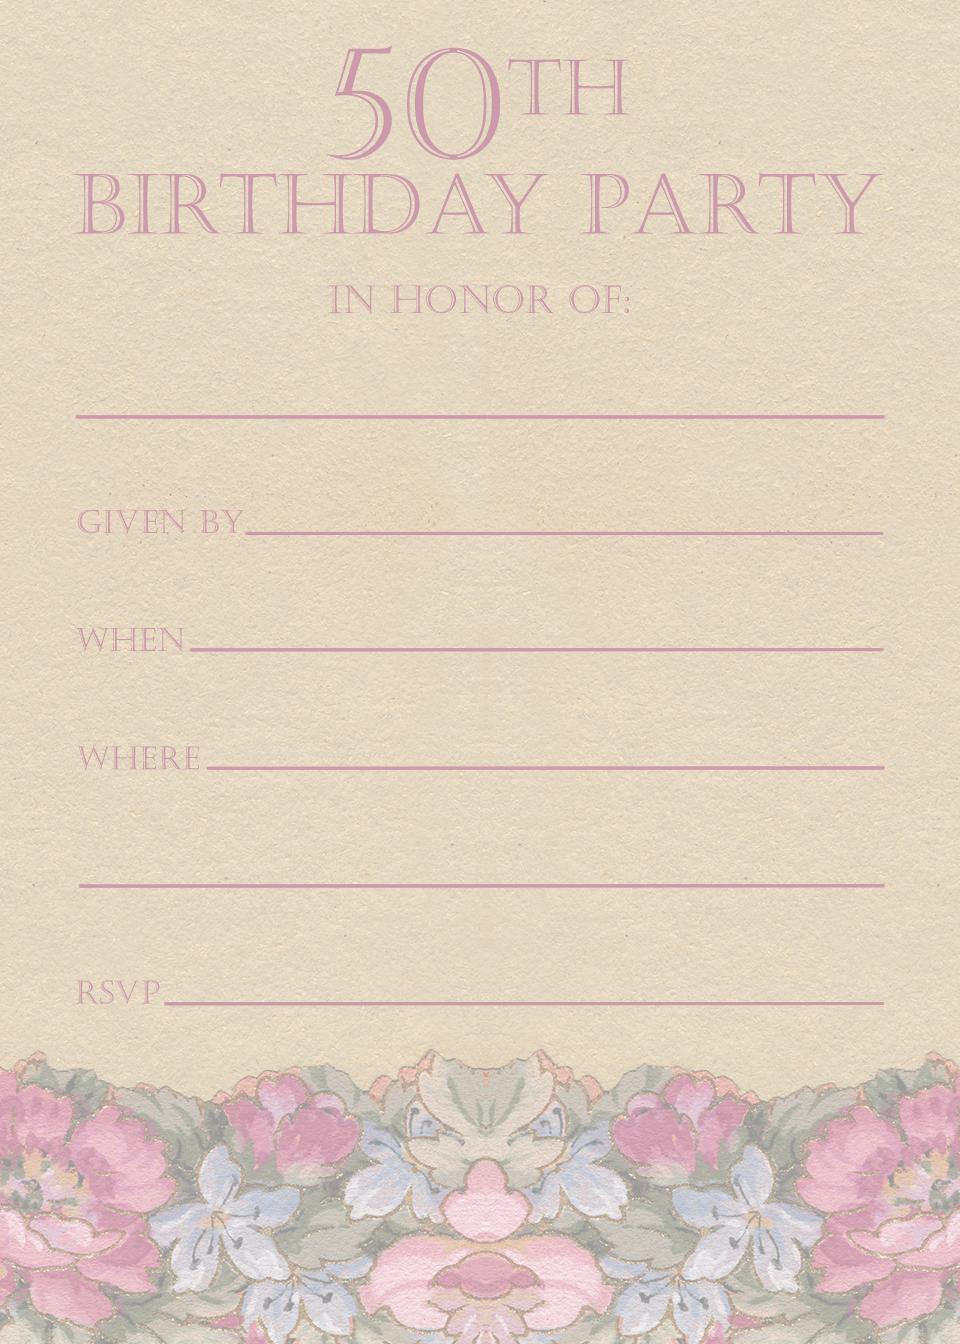 Free Printable 50th Birthday Party Invitation Templates | 50th ...